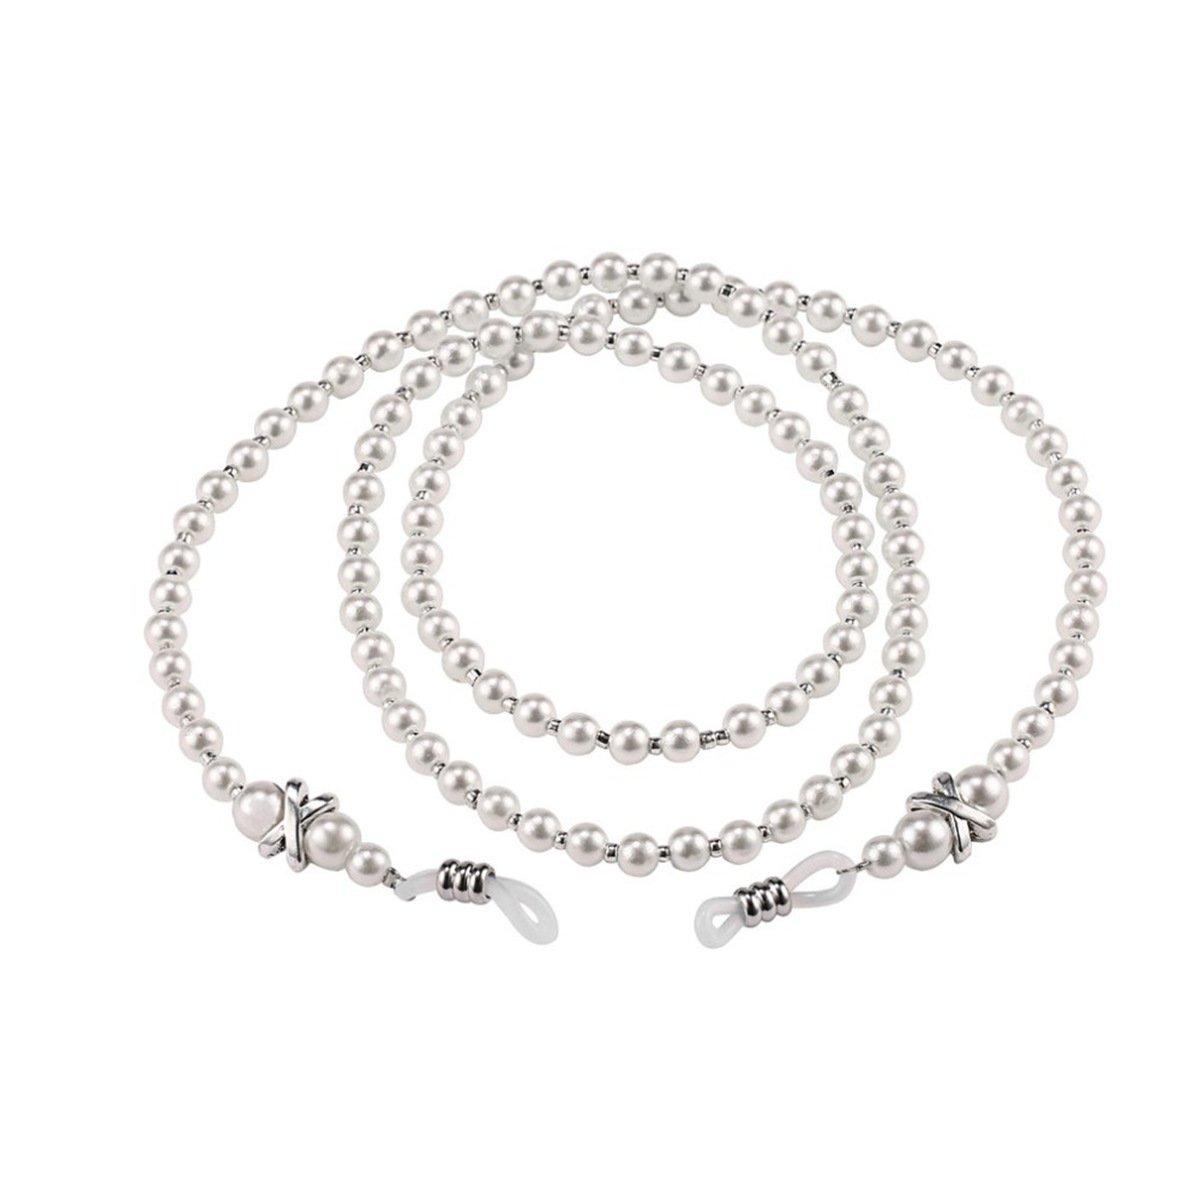 80cm Fashion Imitation Pearl Eyeglass Chains Glasses Necklace Chain Cord Holder ECYC 12295